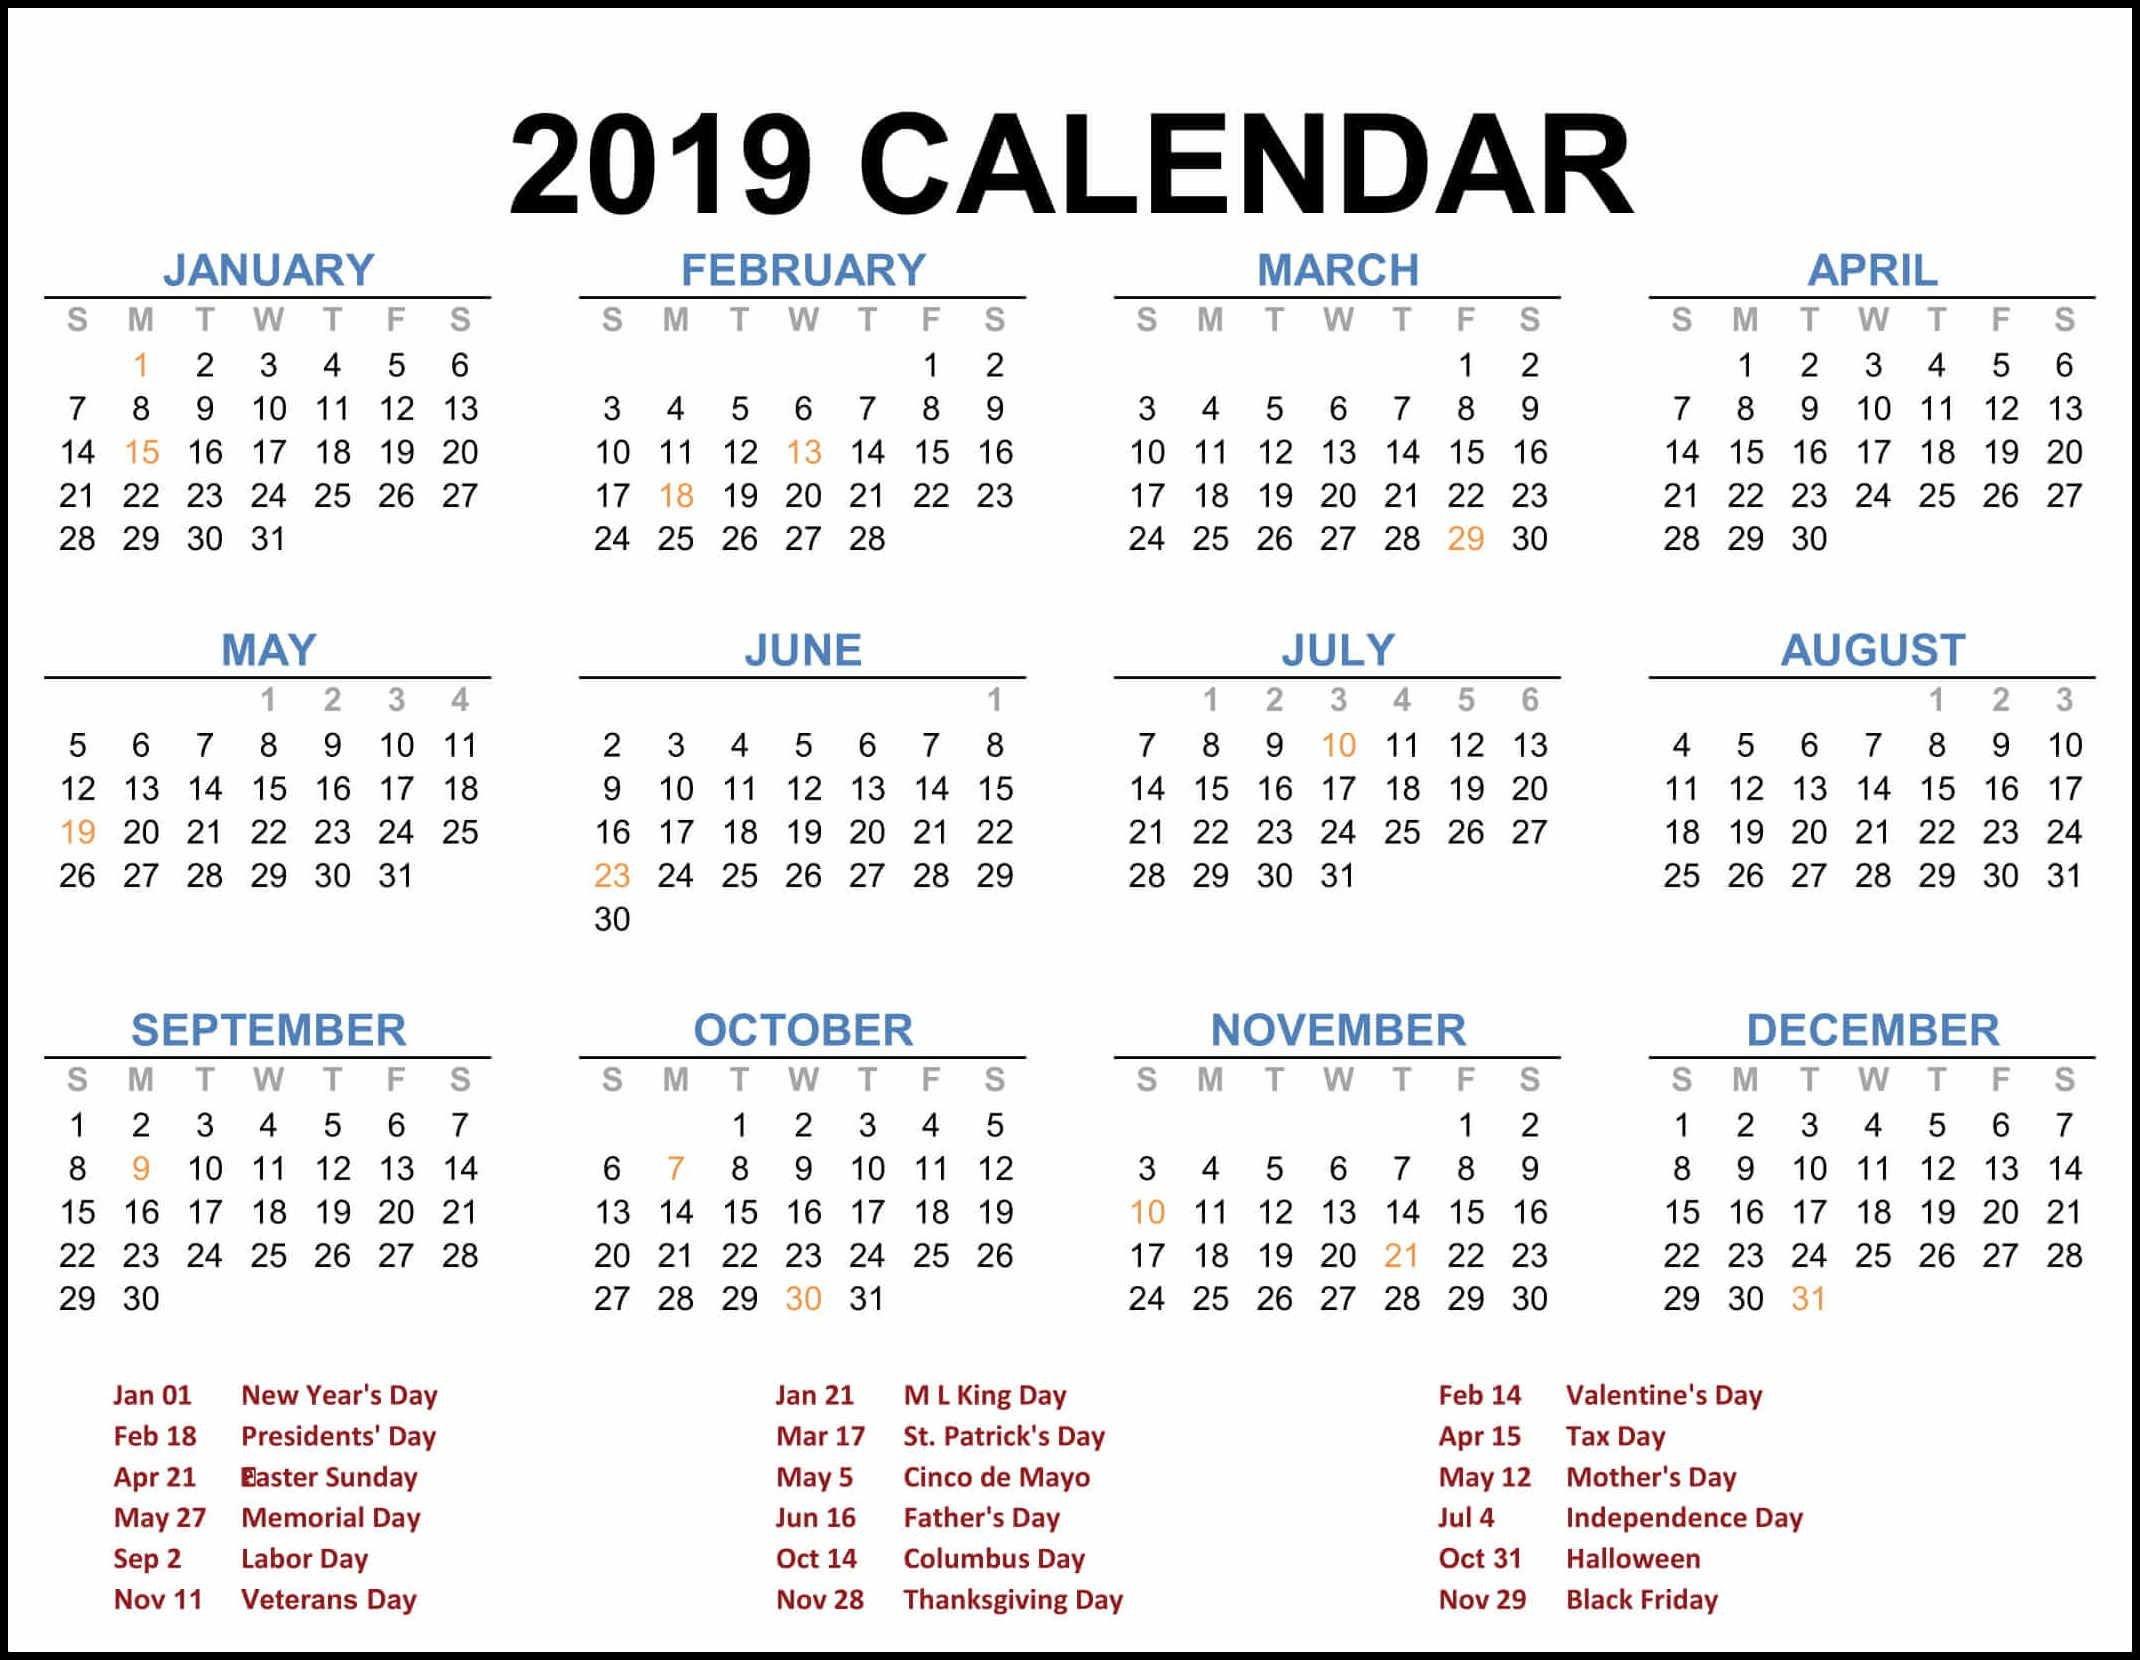 2019 Federal Holiday Calendar   2019 Calendar Template In One Pages Calendar 2019 Federal Holidays